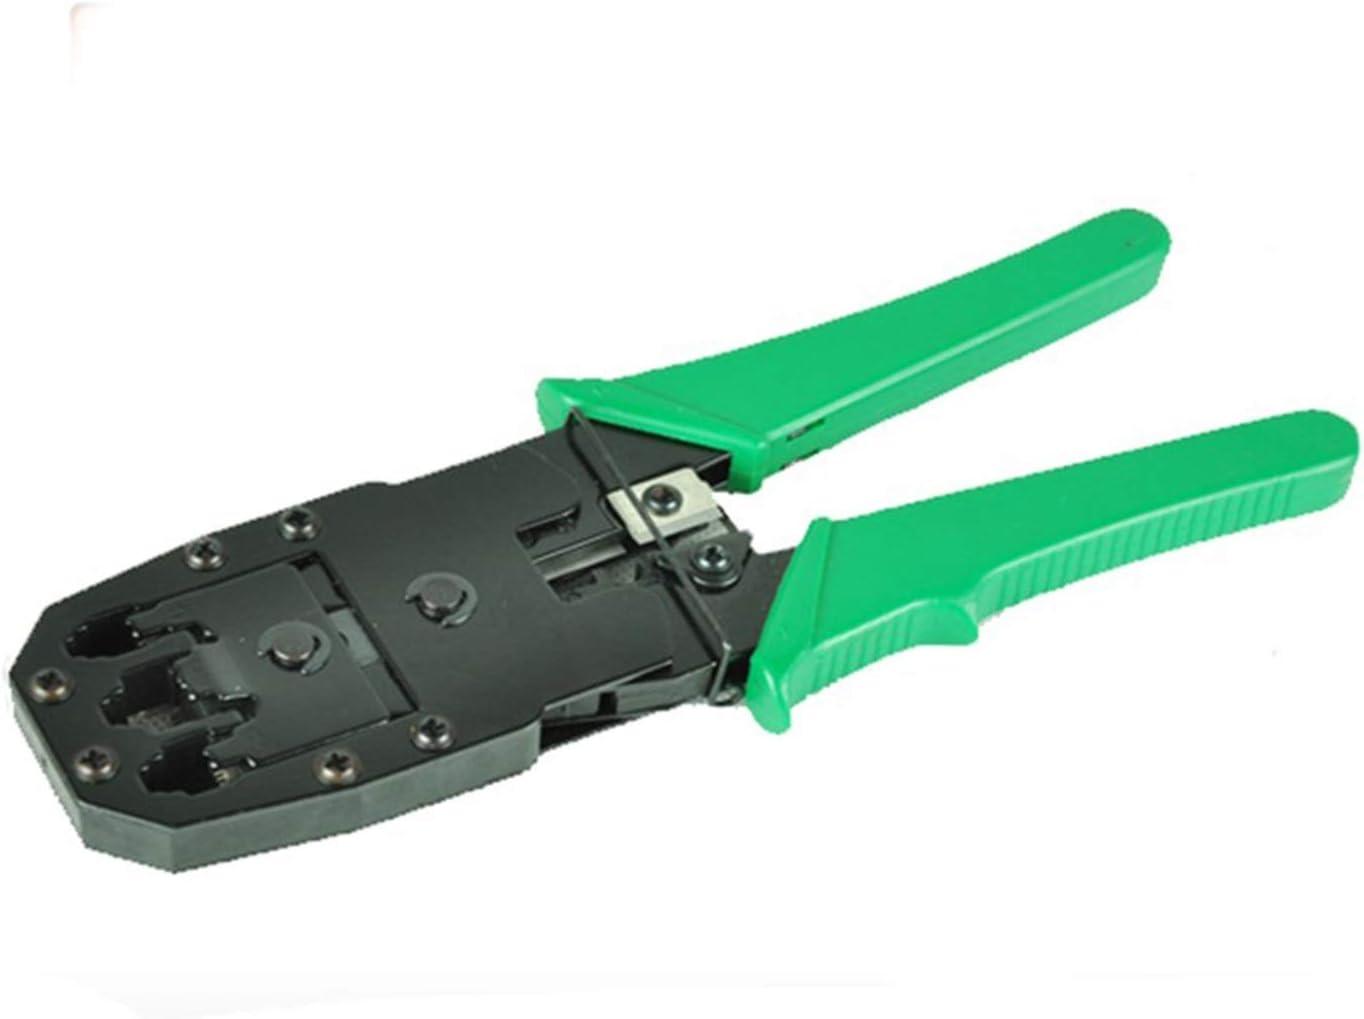 lifebea Crimping Tool Battery Max 55% OFF Overseas parallel import regular item Lug RJ1 RJ10 Crimper RJ45 4p